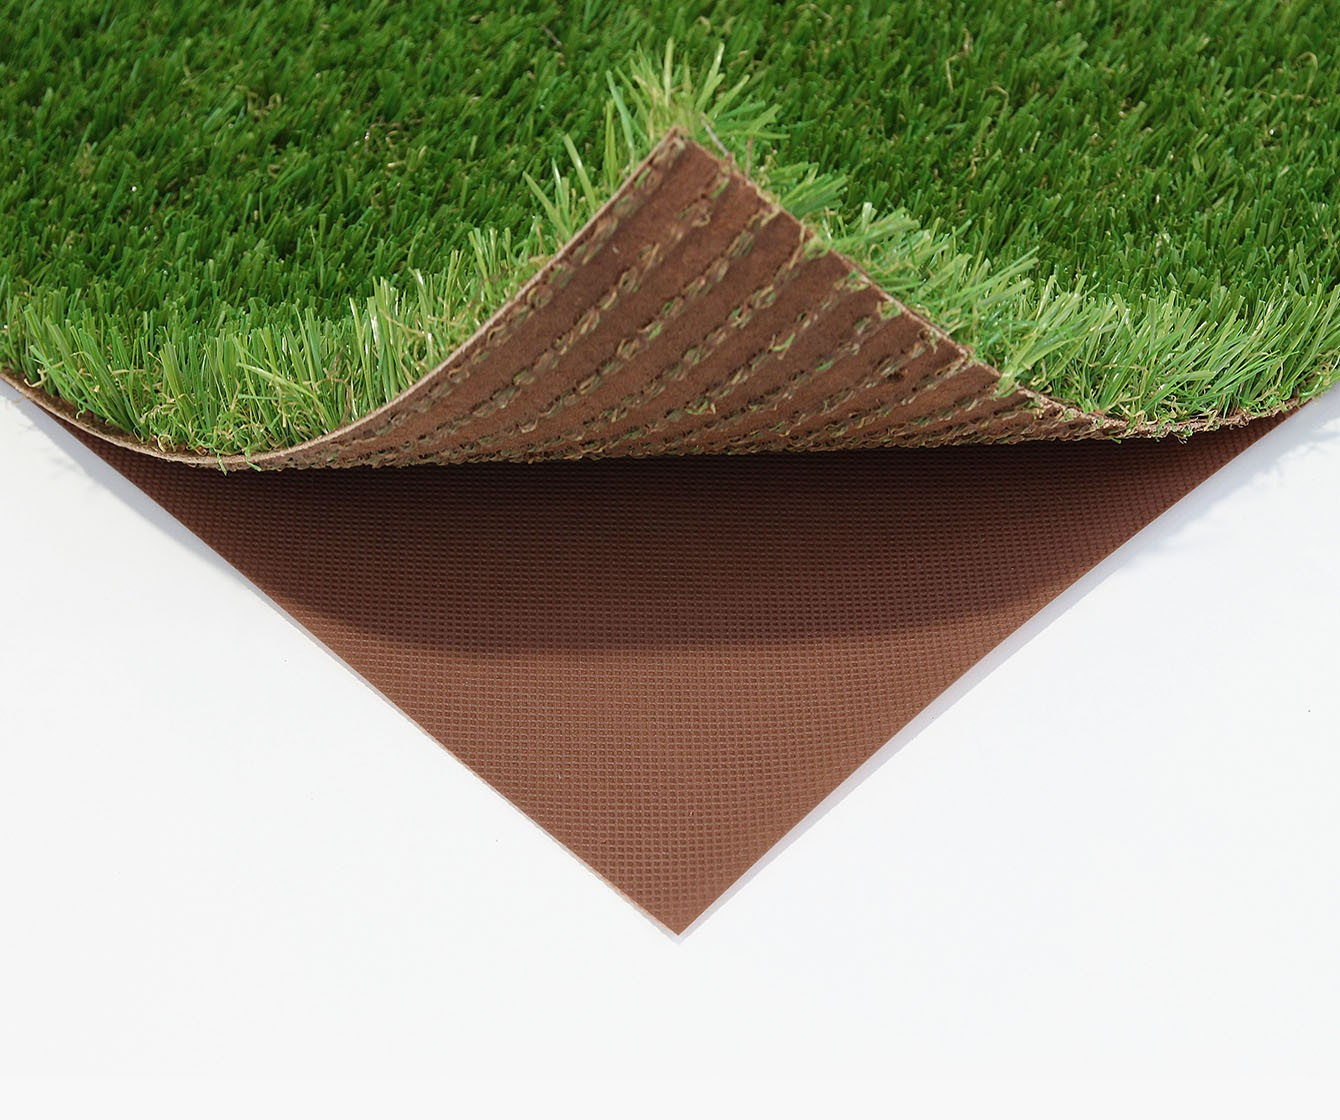 Geotextile Roll - 2M X 30M. For Artificial Grass avec Geotextile Jardin